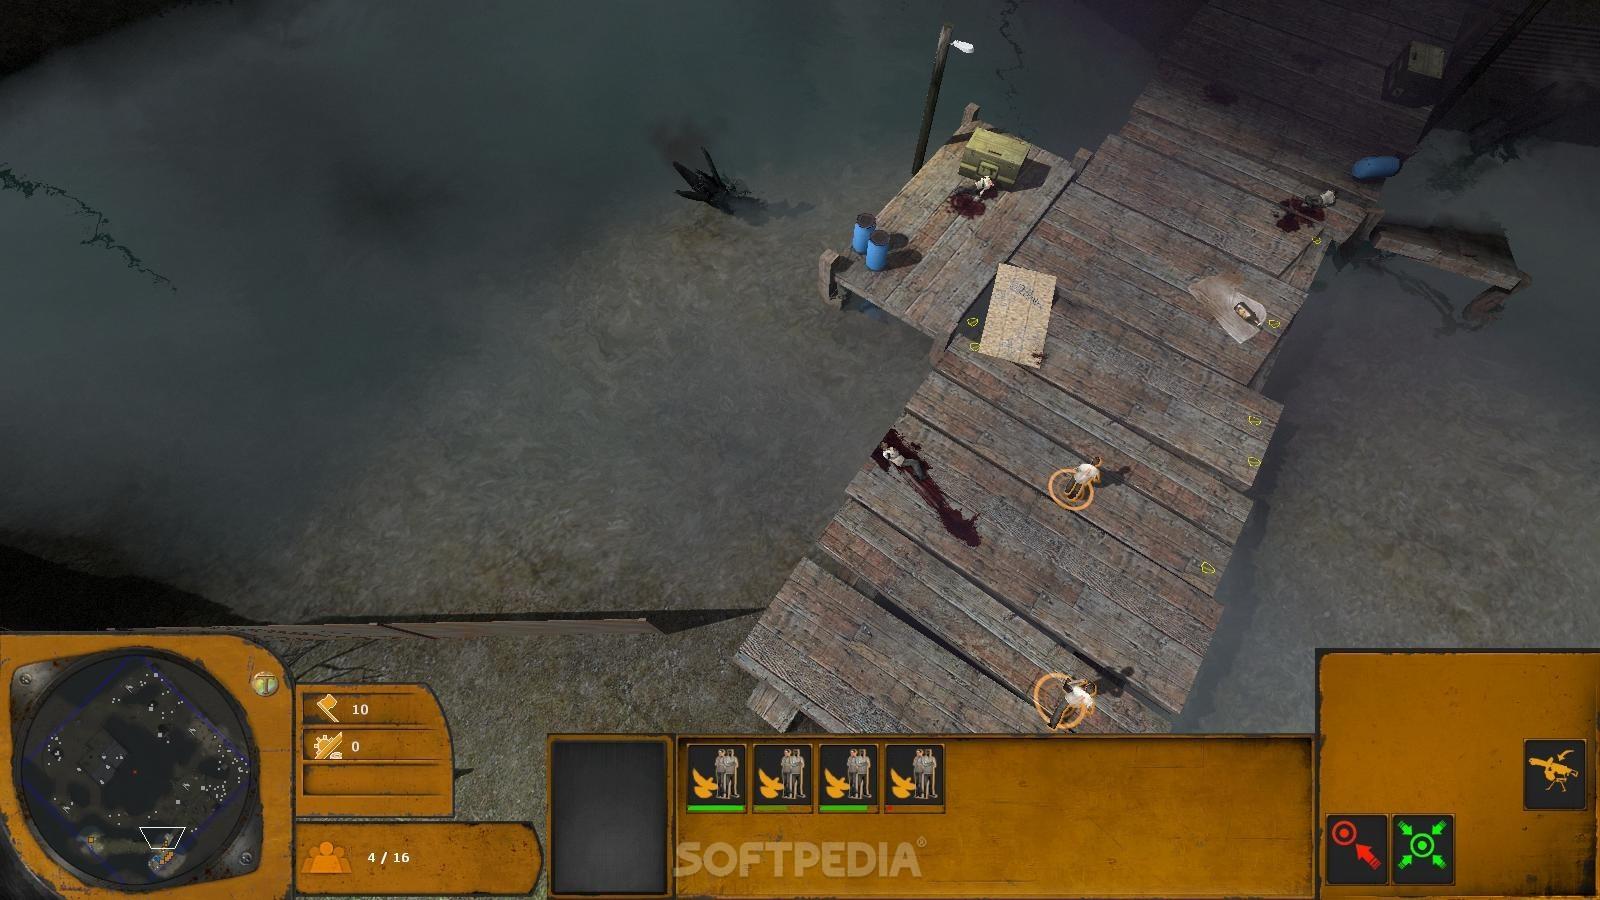 Lambda Wars (Mod) Turns Half-Life 2 into a Real-Time